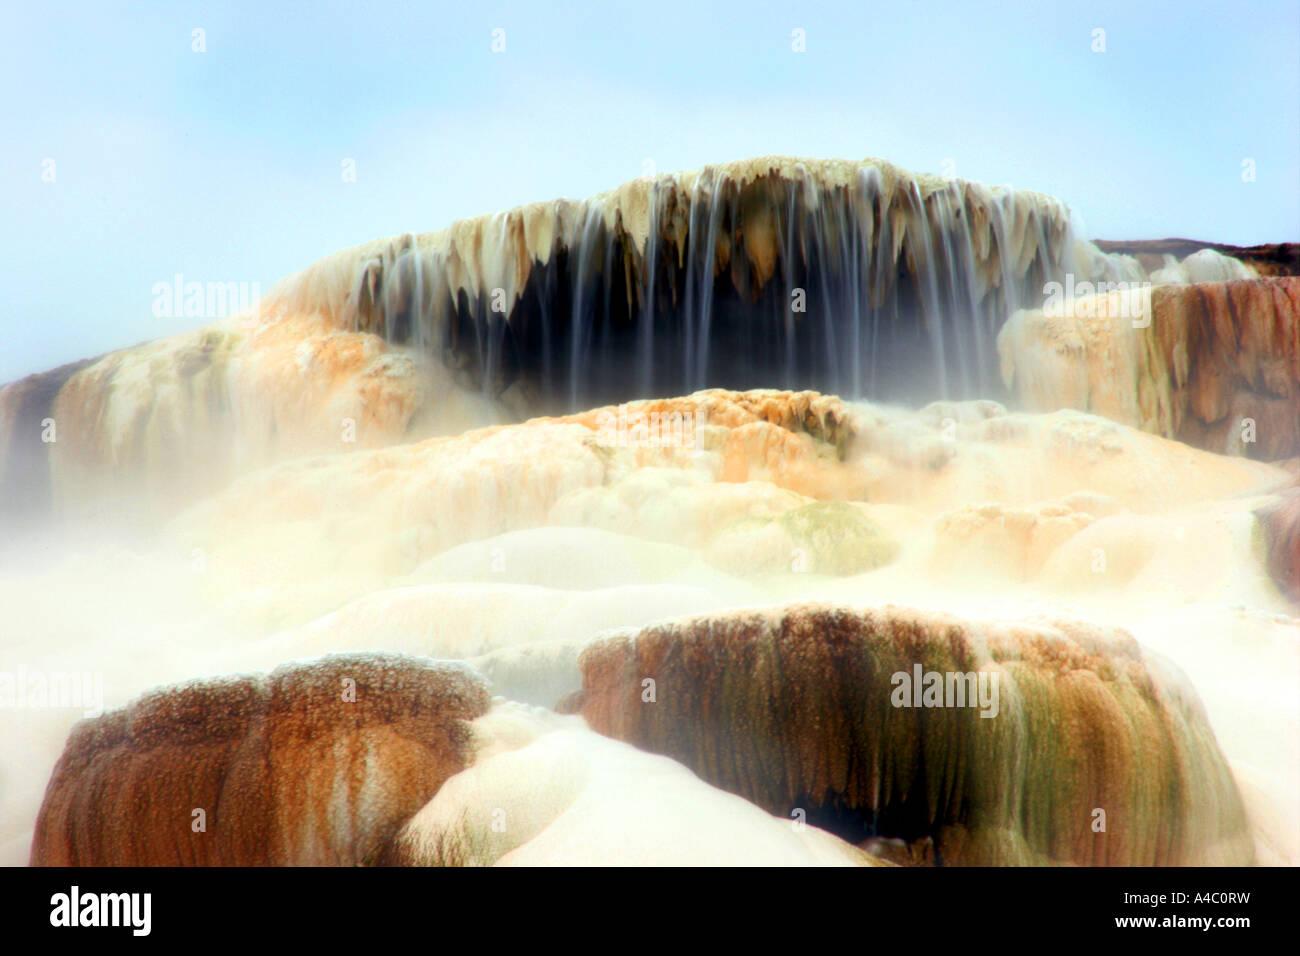 minerva  terrace, mammoth hot springs, yellowstone national park, wyoming - Stock Image